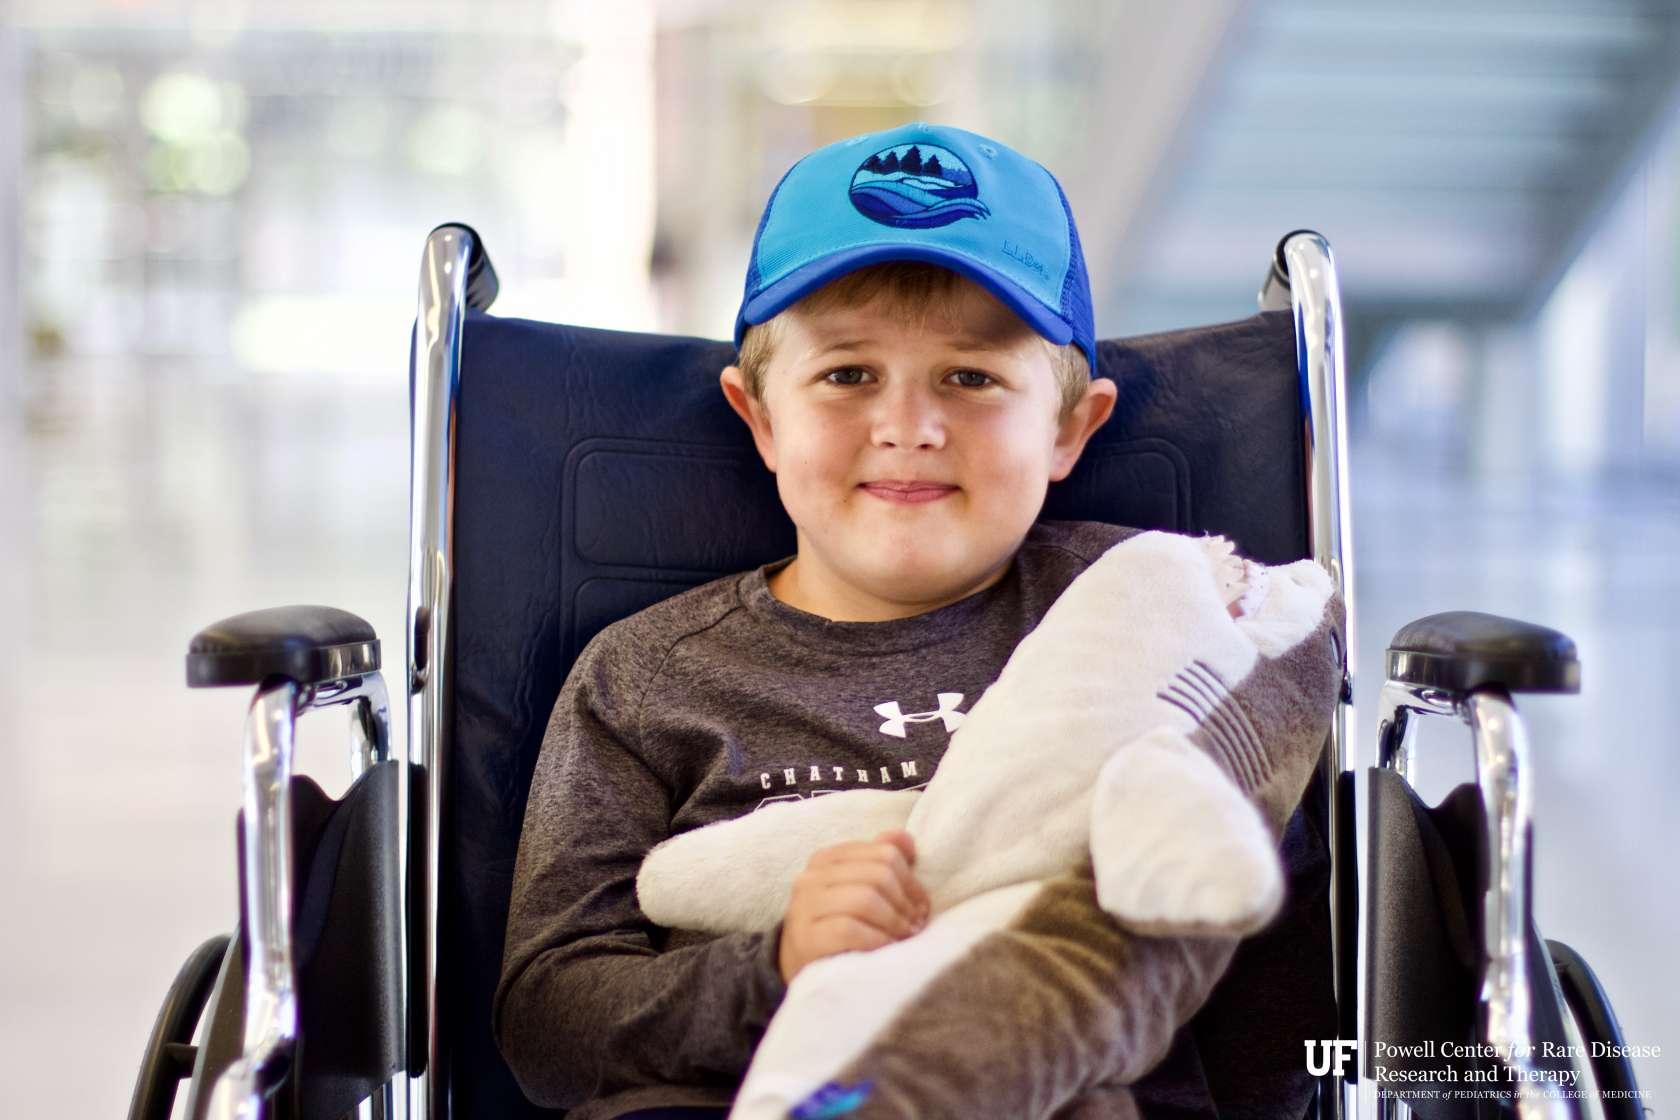 Boy wearing a blue hat sitting in a wheel chair holding stuffed shark